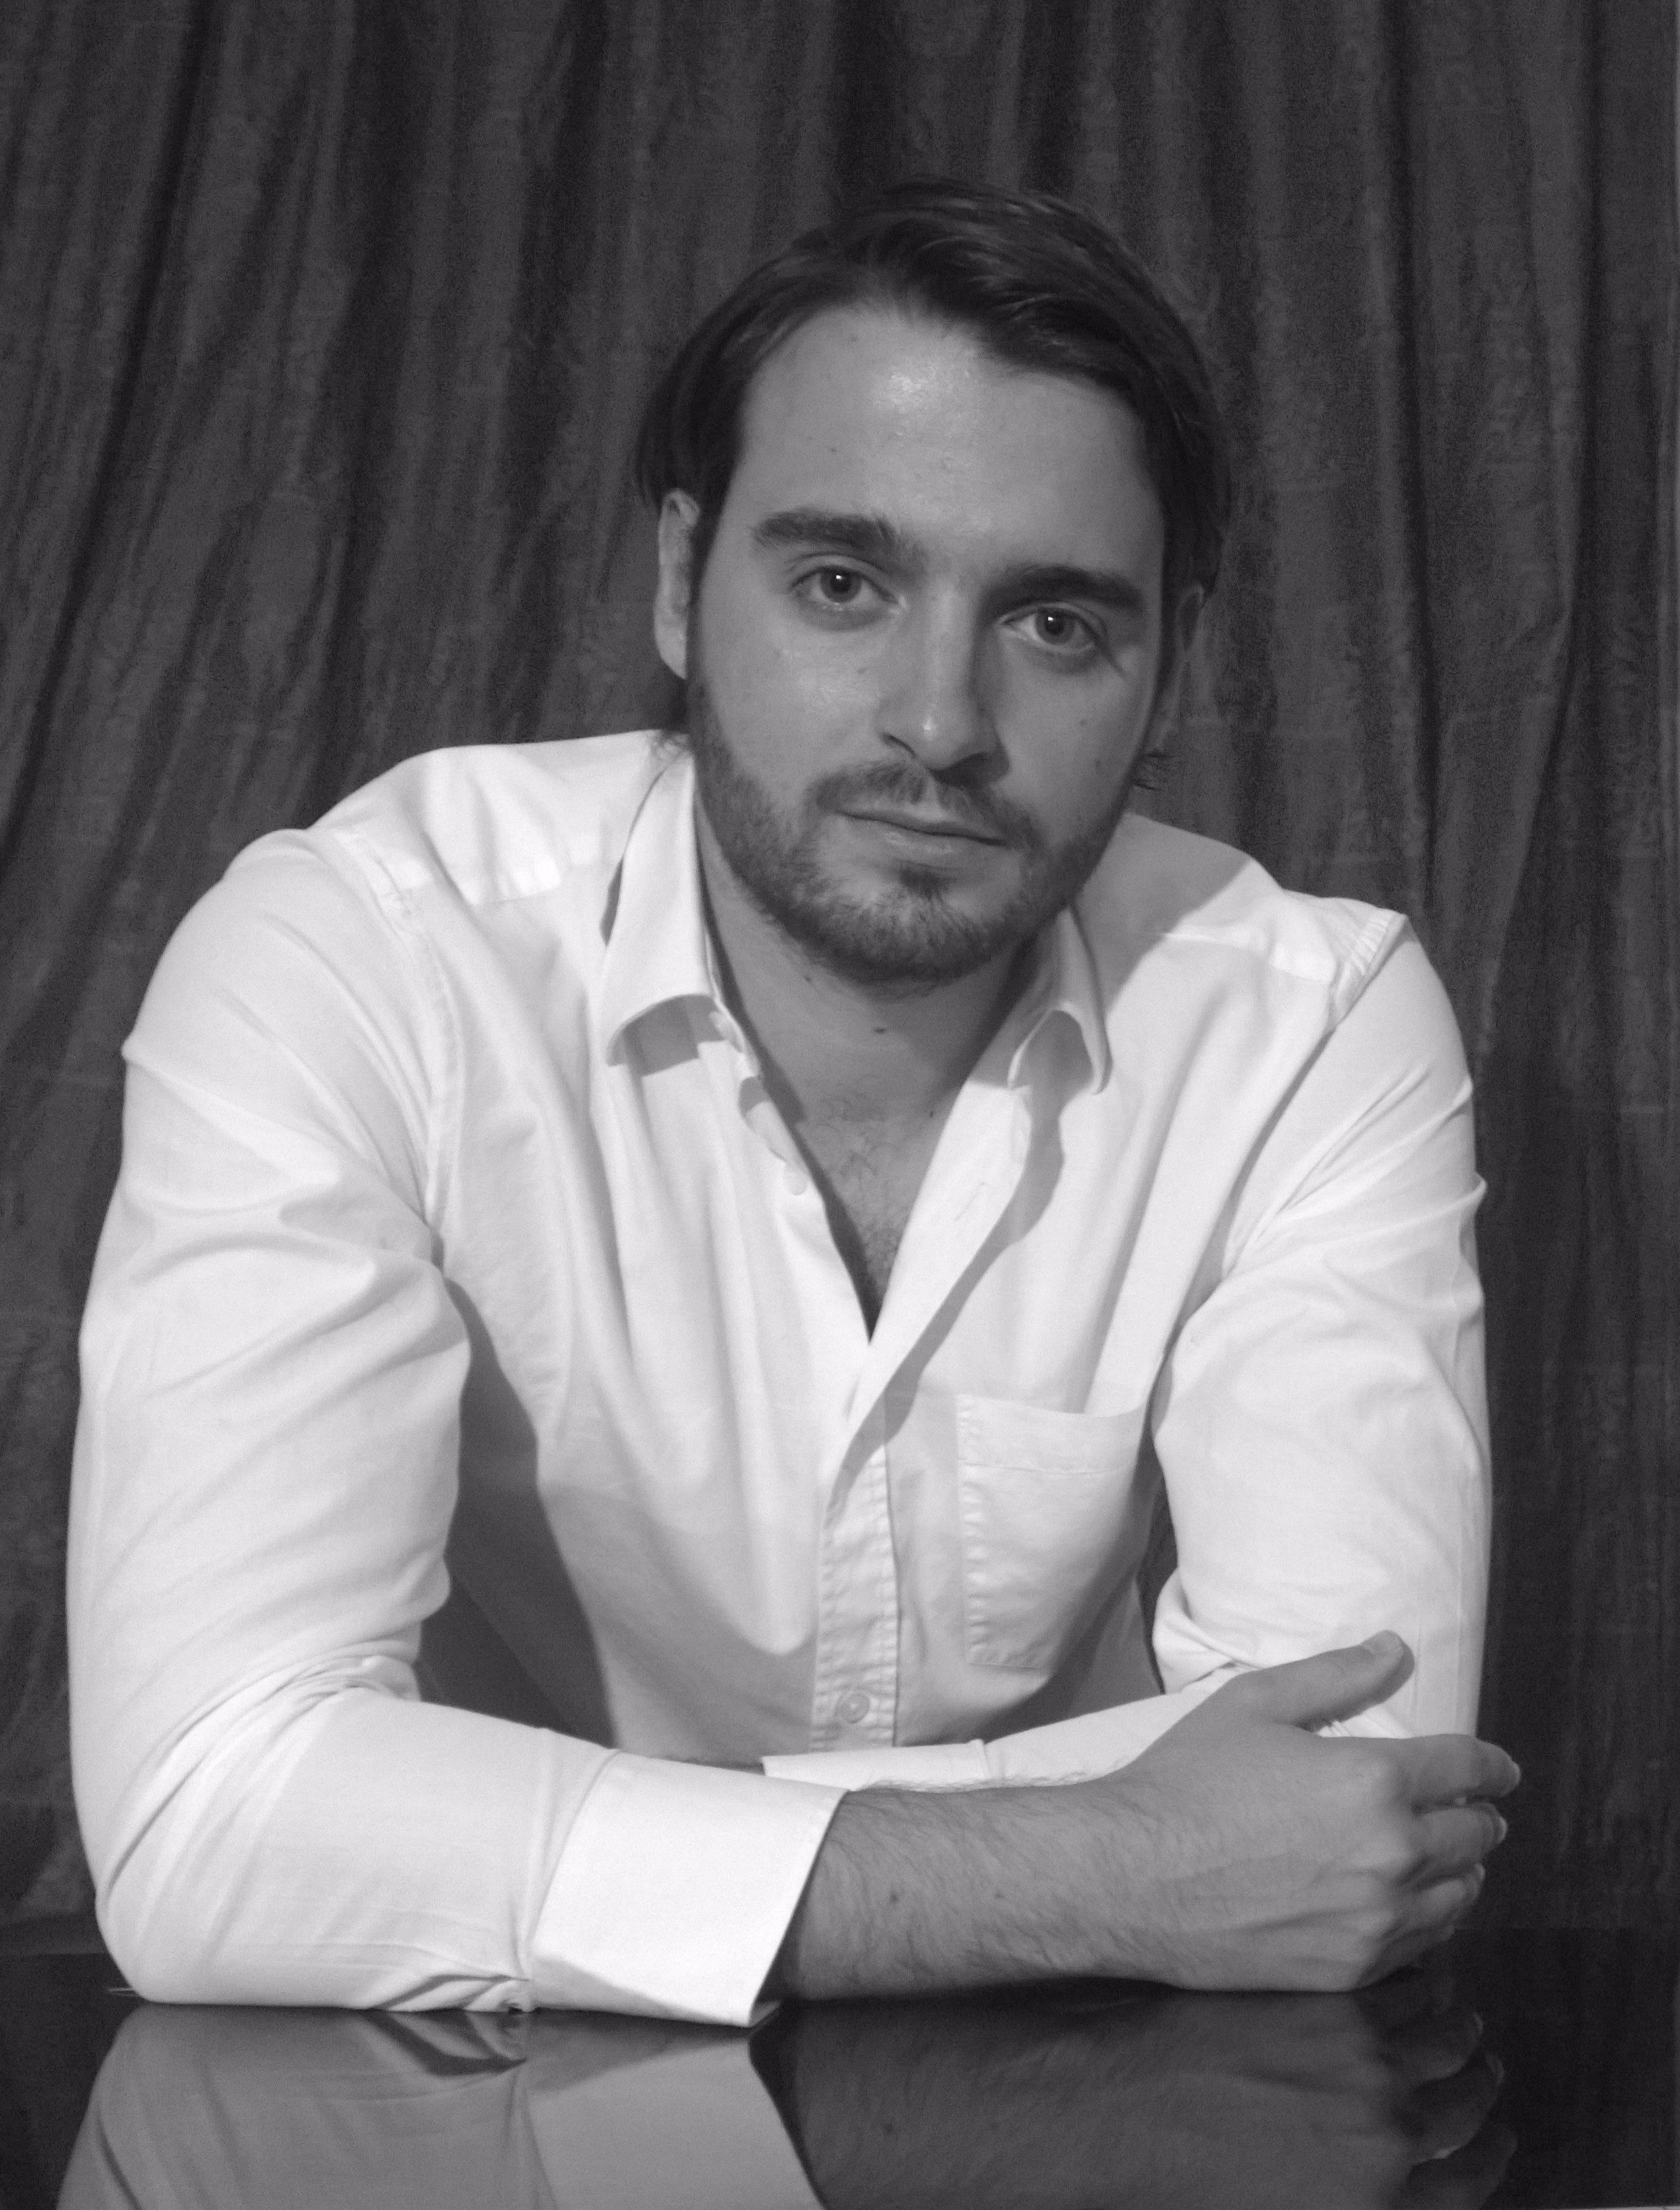 Pierre-Alexandre Zucca